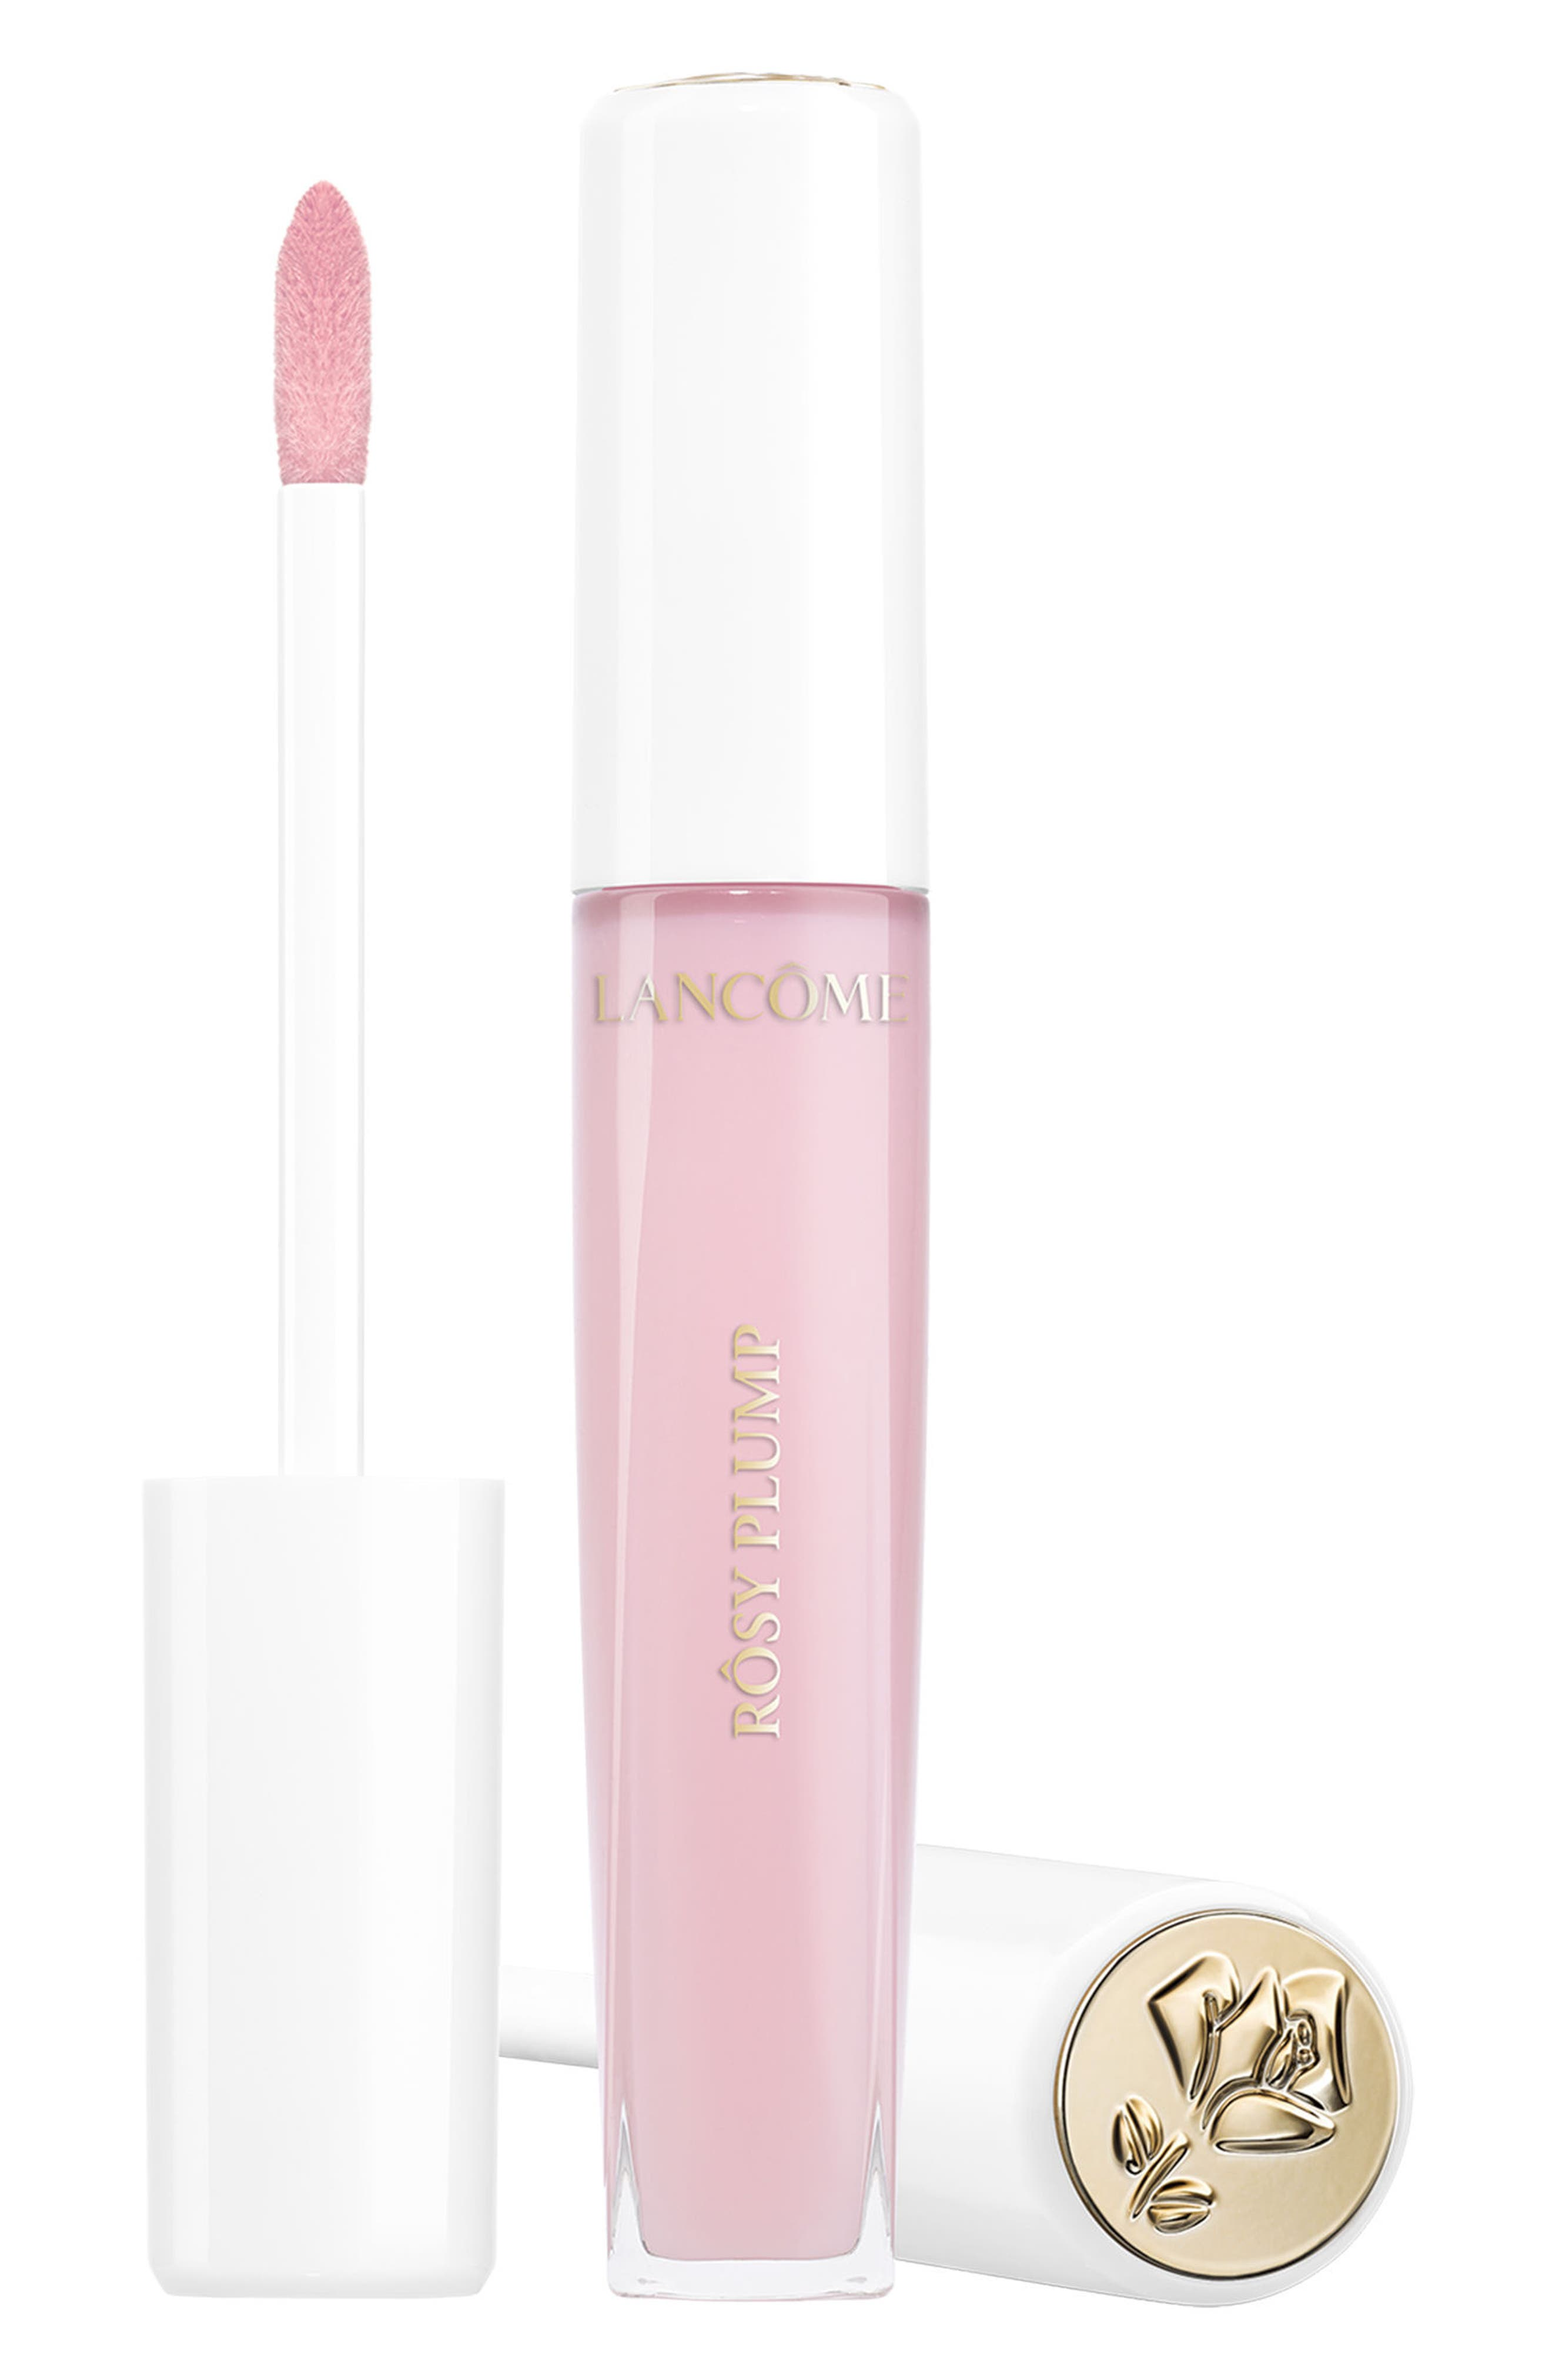 Lancome L'Absolu Gloss Sheer